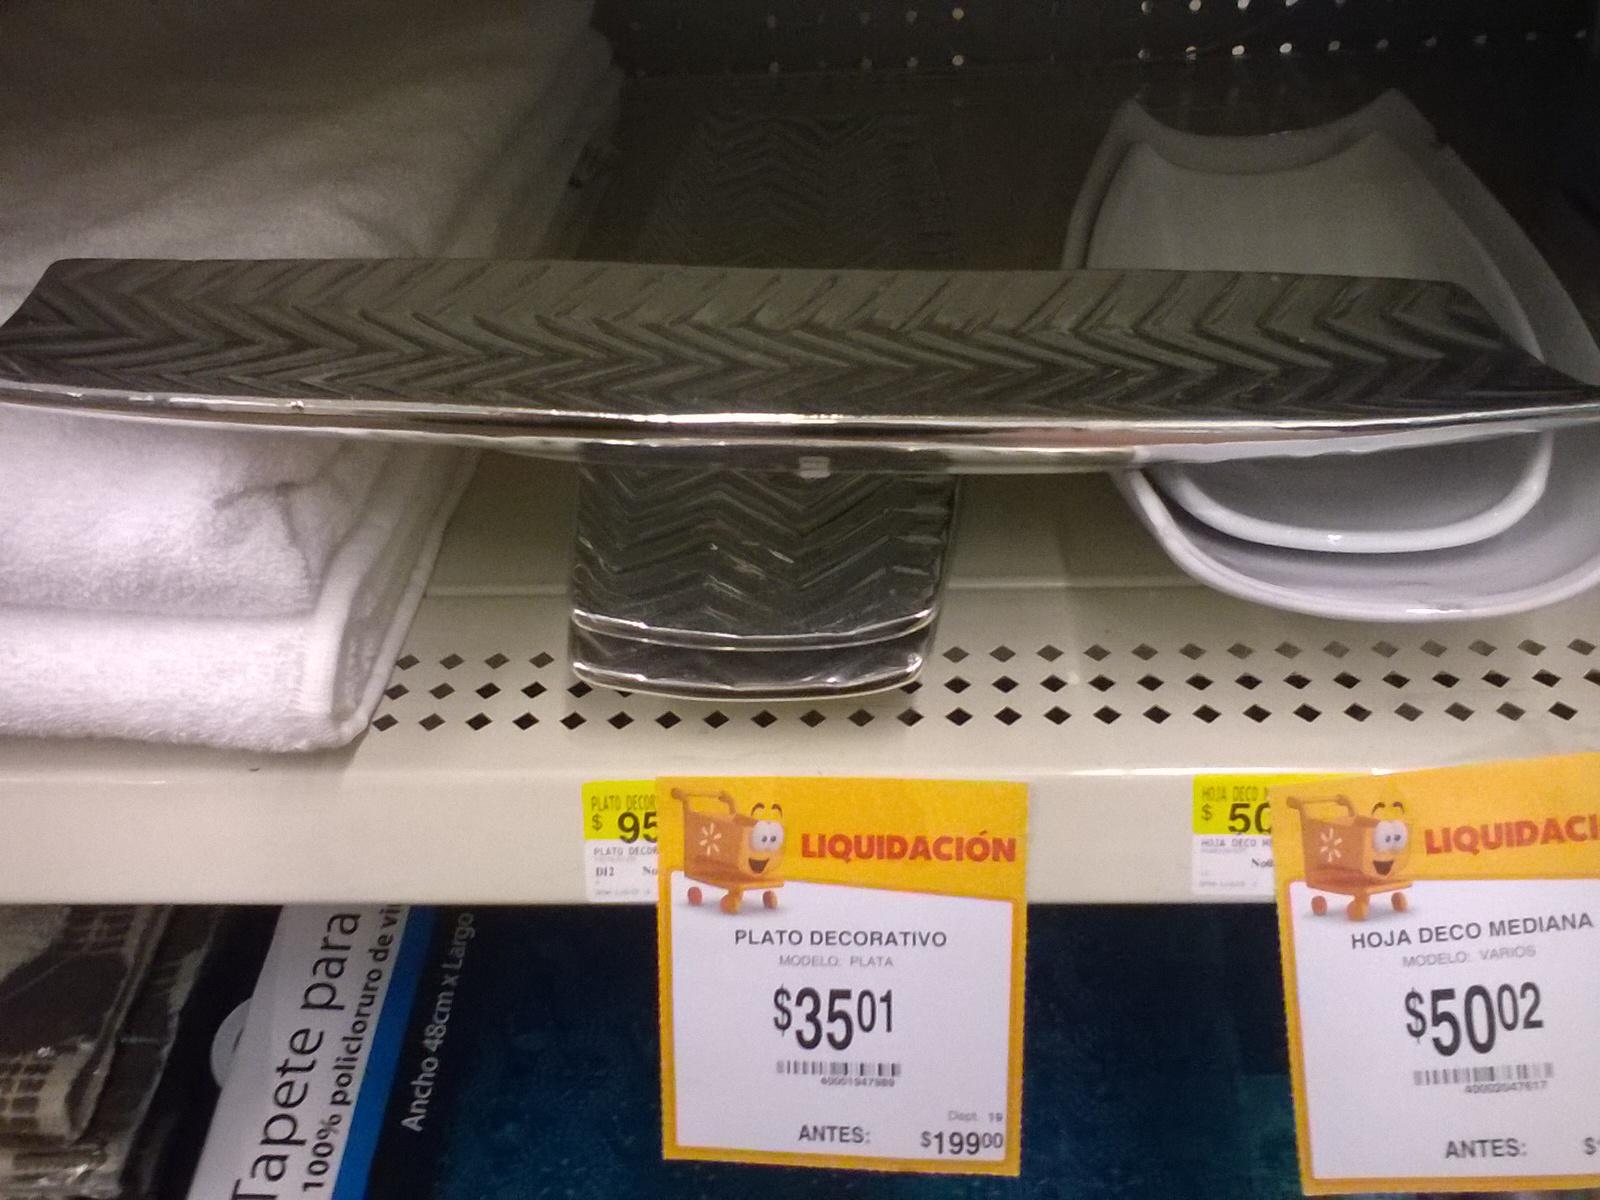 Walmart Carrizal - Villahermosa - Plato decorativo 35.01, Almohada Decorativa Star Wars (90x50cm) $65.02; Kracker Bites de Hersheys $7.02